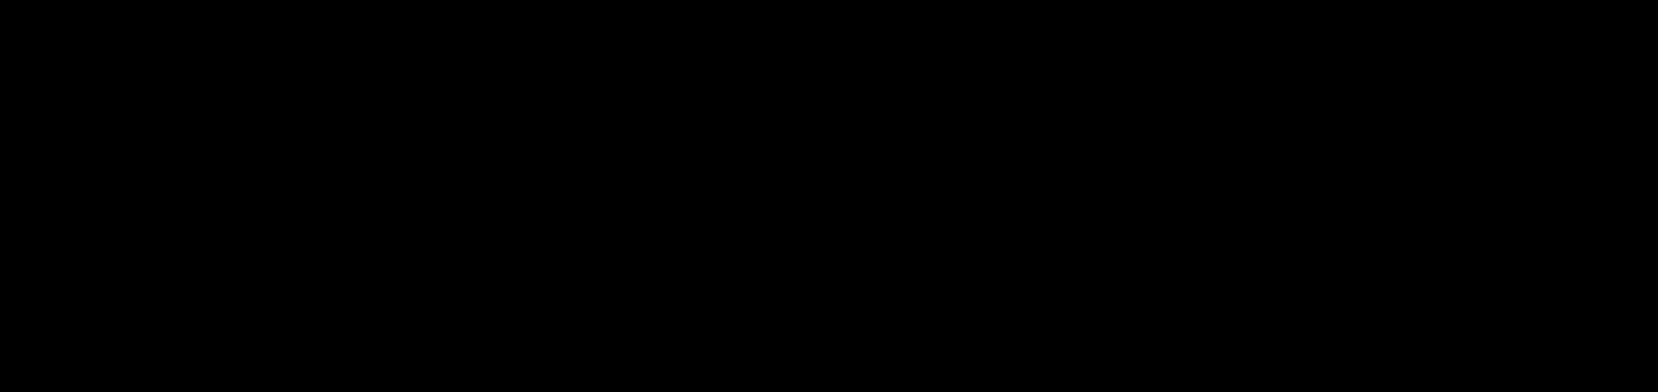 Squarespace logo horizontal black